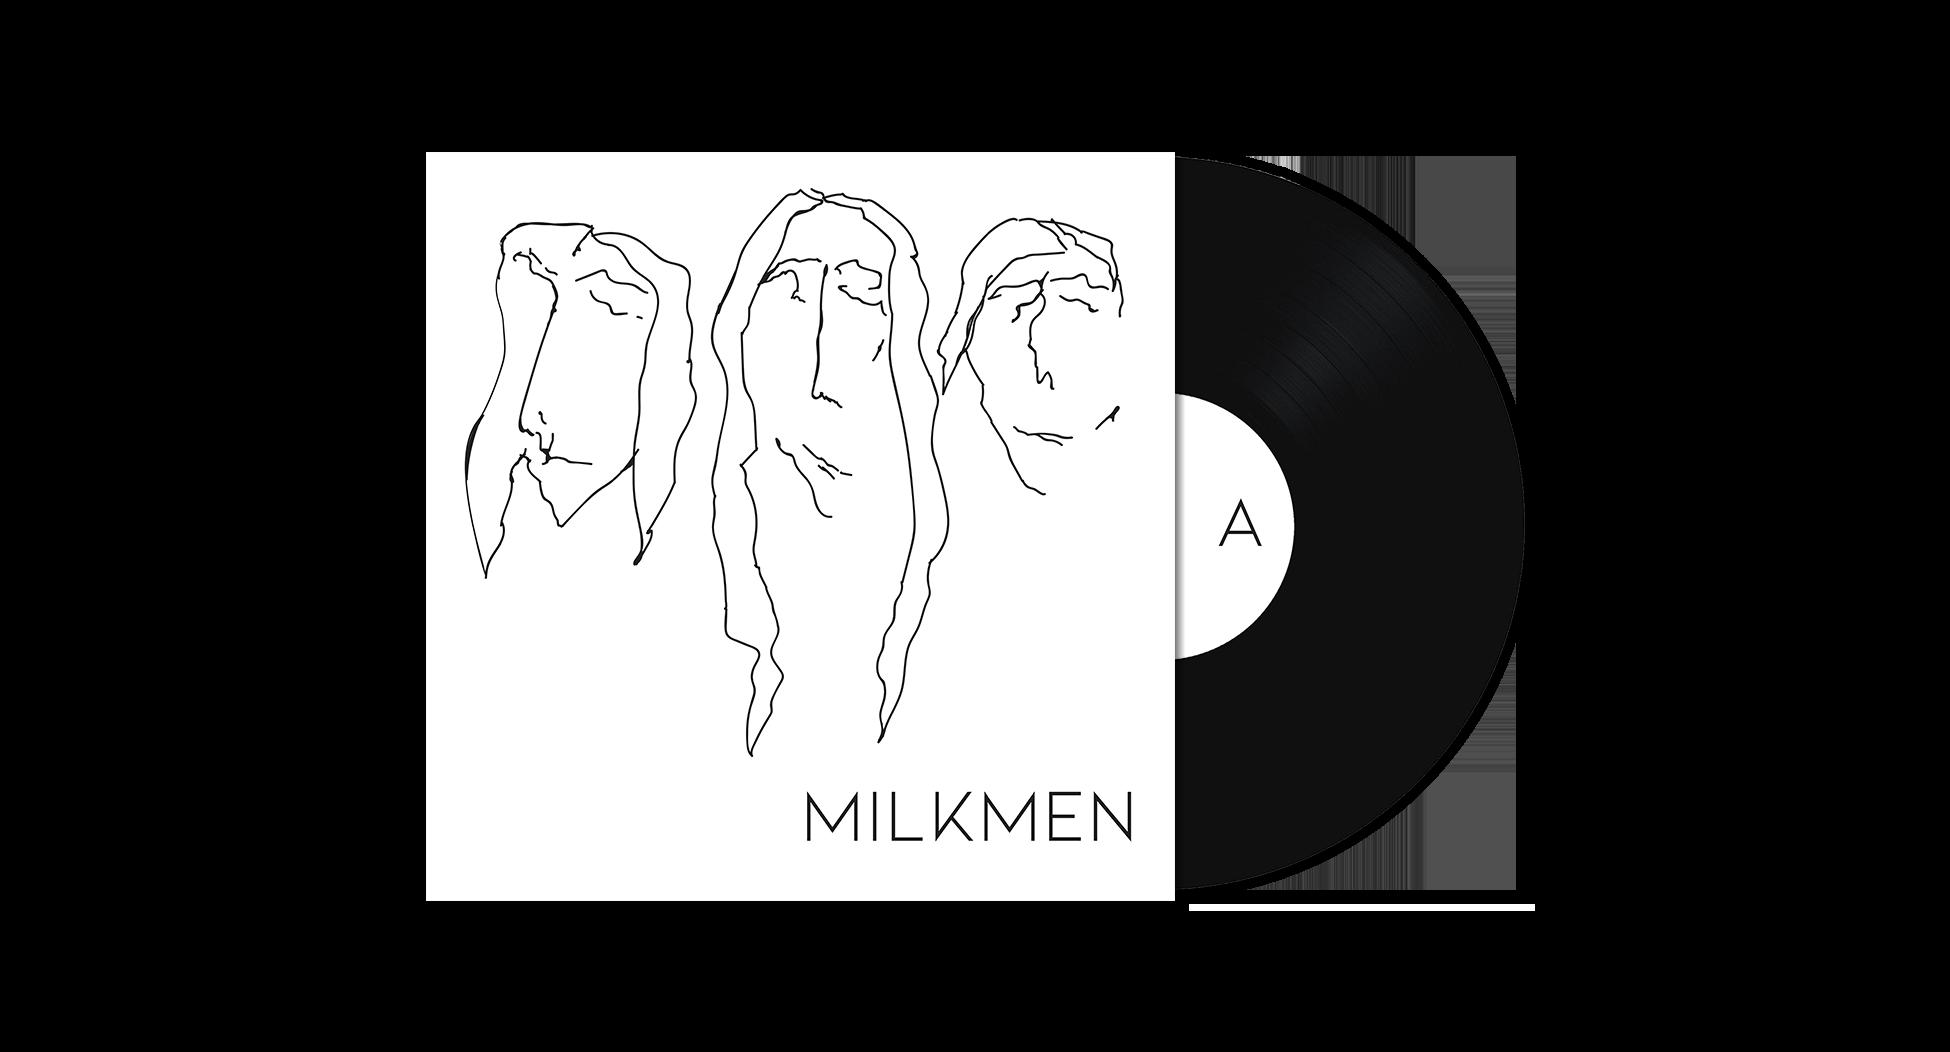 Milkmen - Self-Titled LP